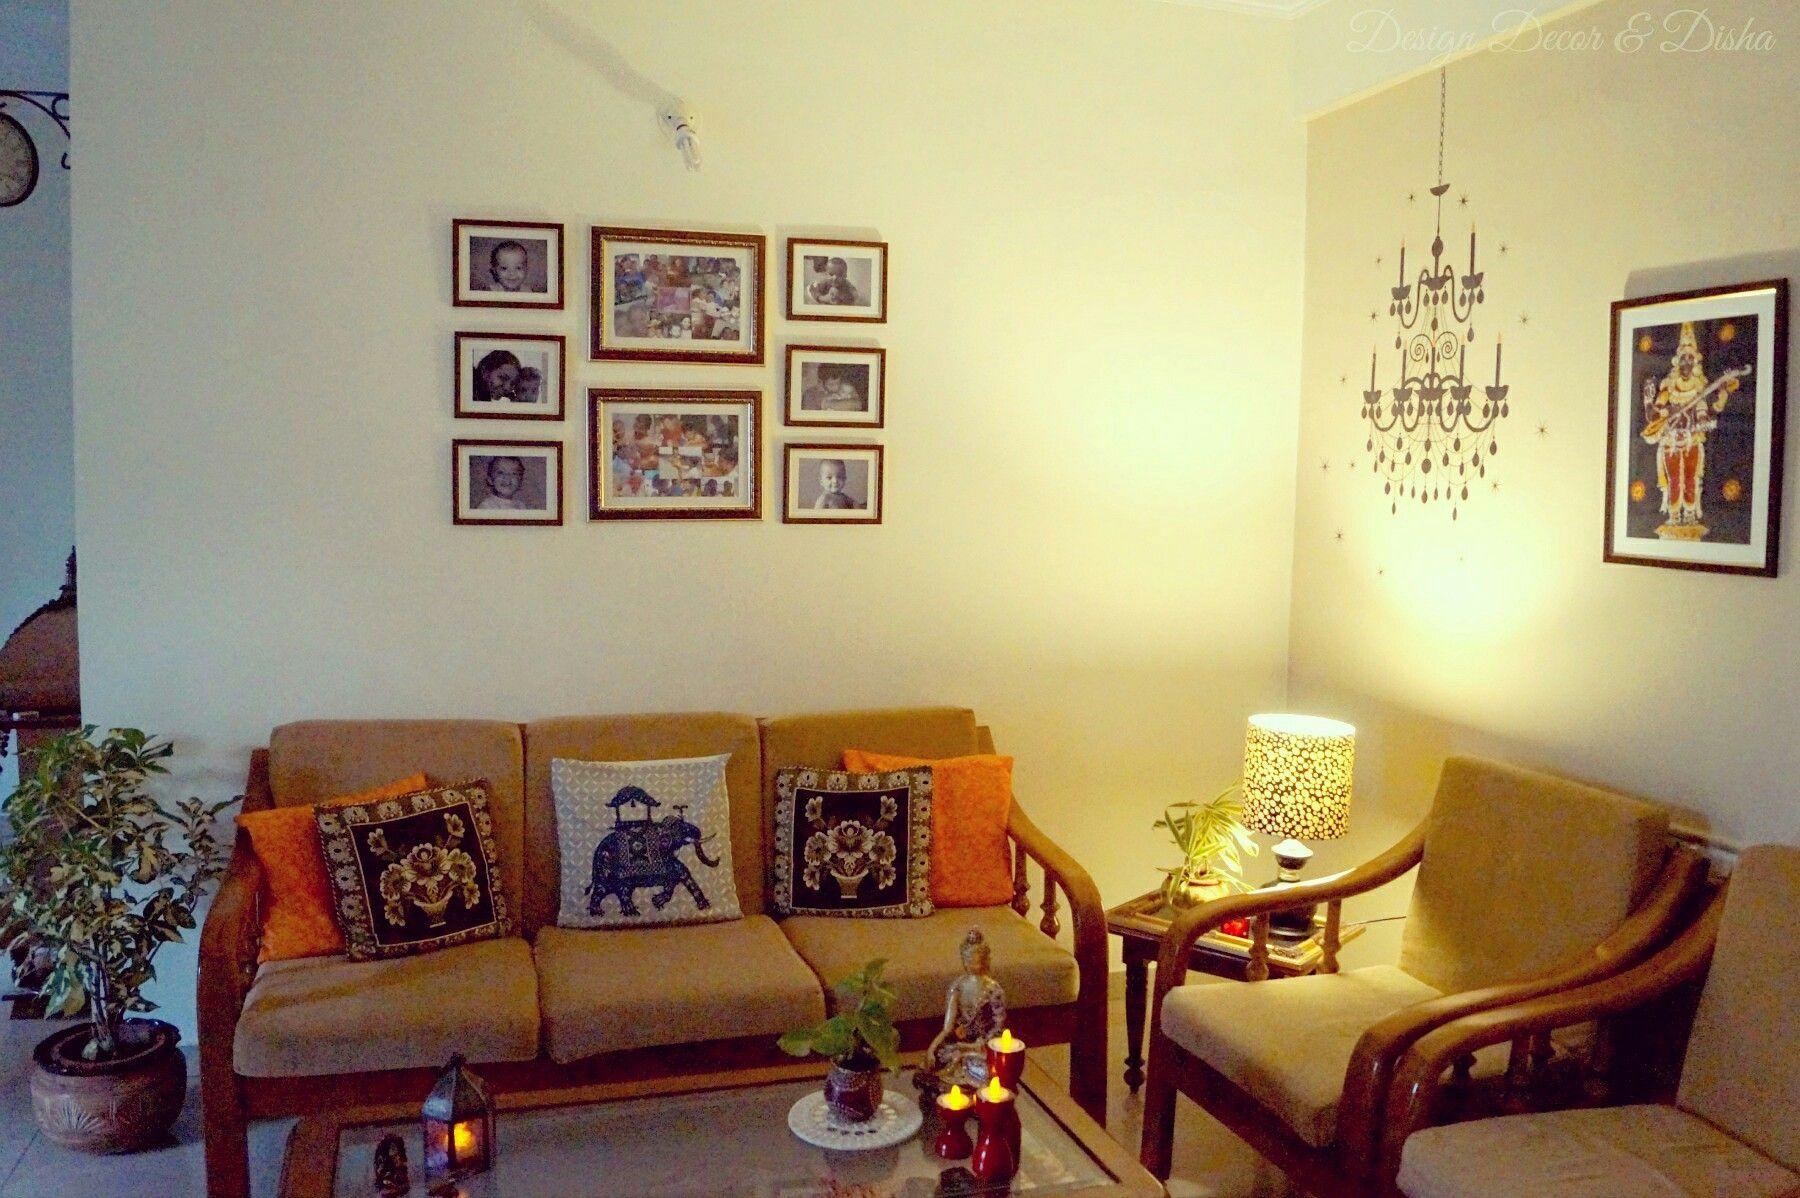 Pin by Vidya Govindarajan on Indian decor | Pinterest | Interiors ...